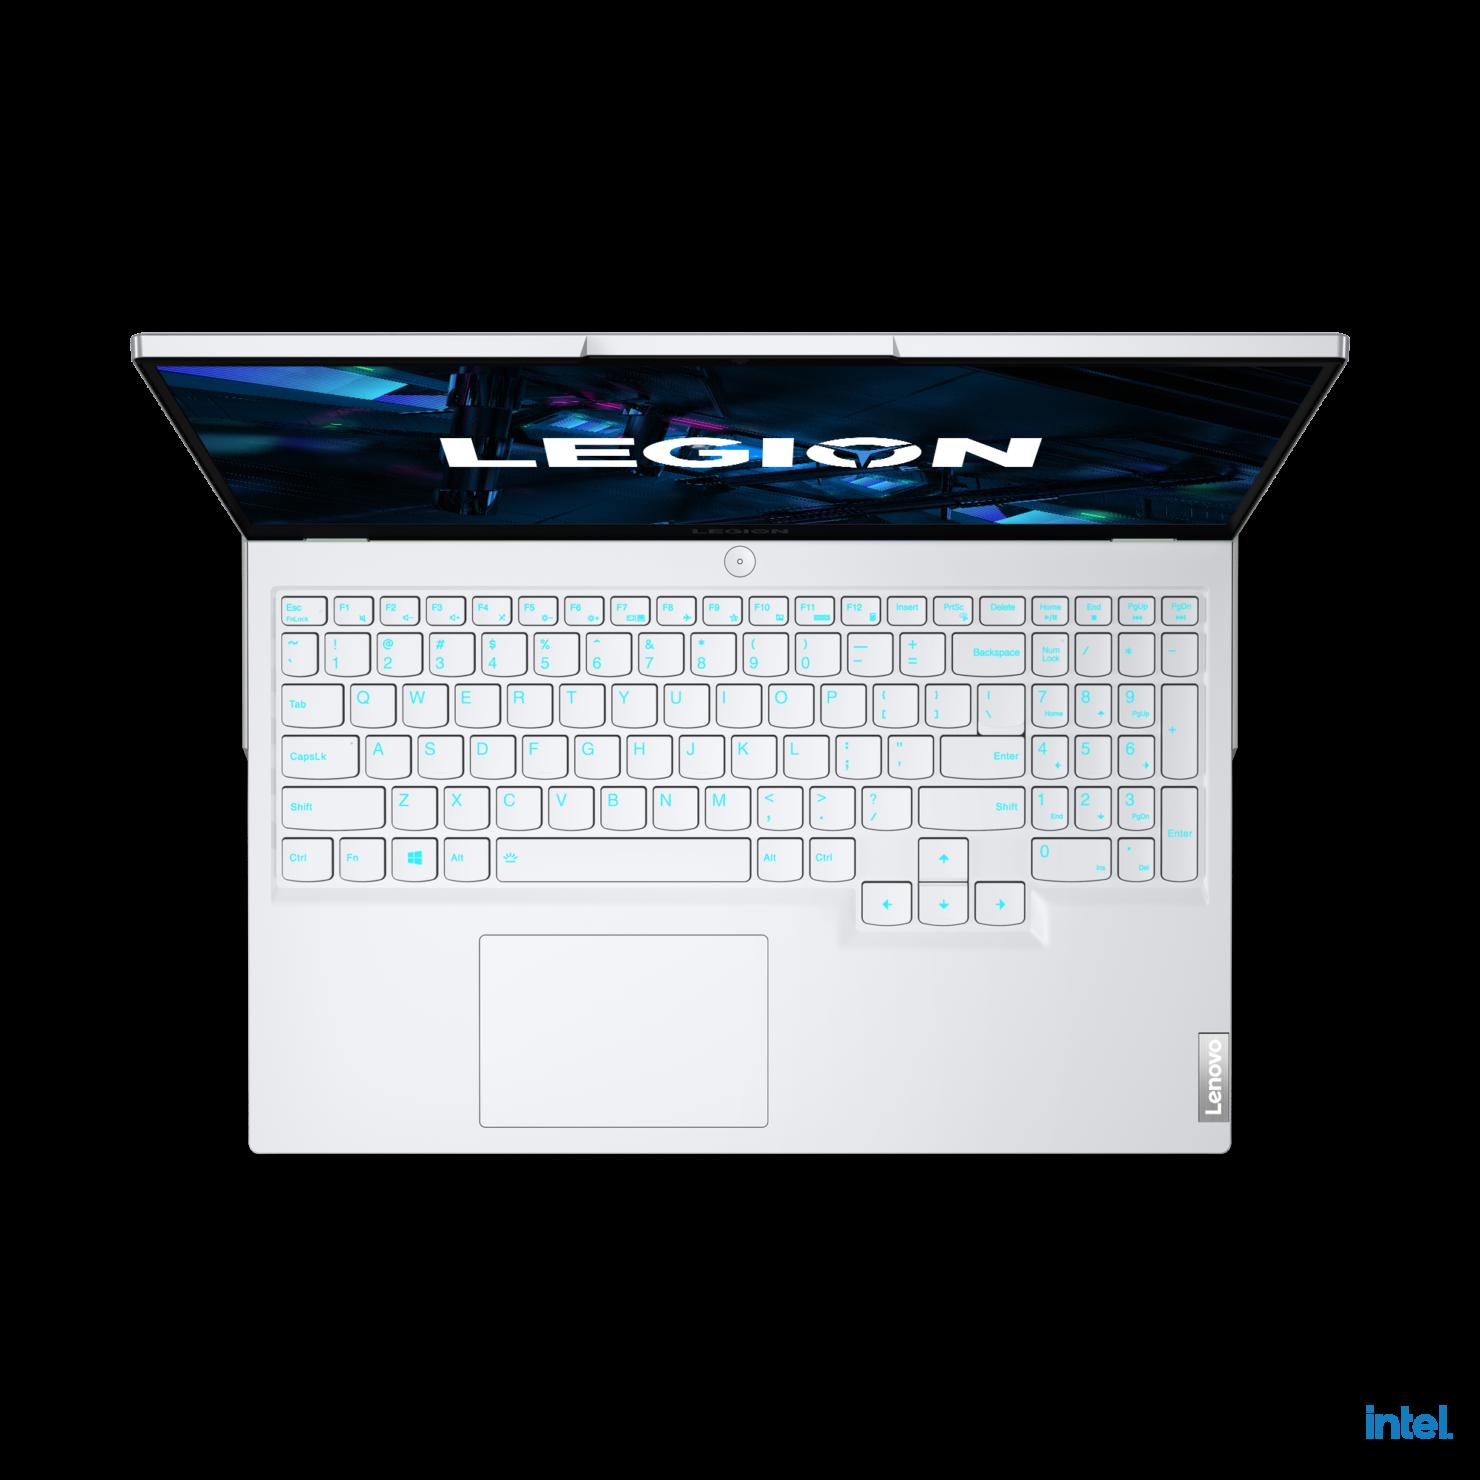 lenovo-legion-5i_top_view